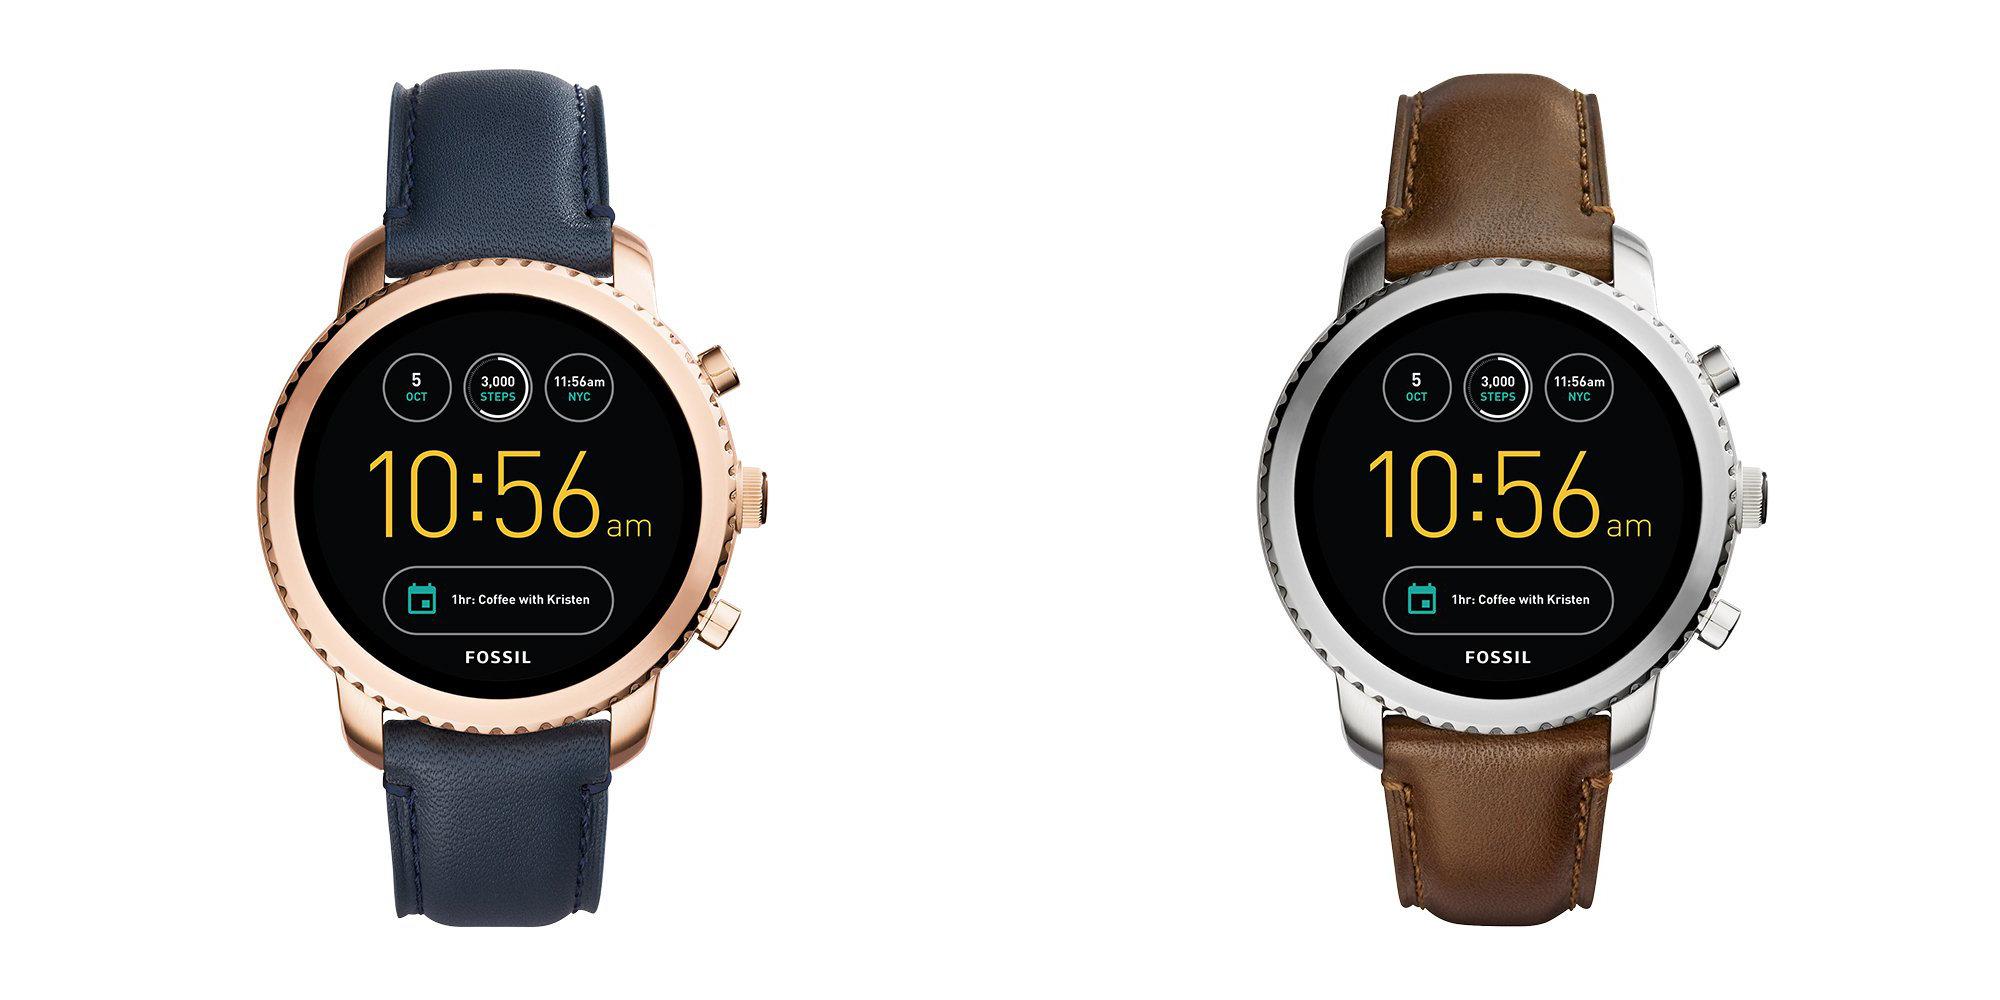 QnA VBage WearOS awaits w/ Fossil's Gen 3 Explorist Smartwatch for $156.50 (Reg. $180+)